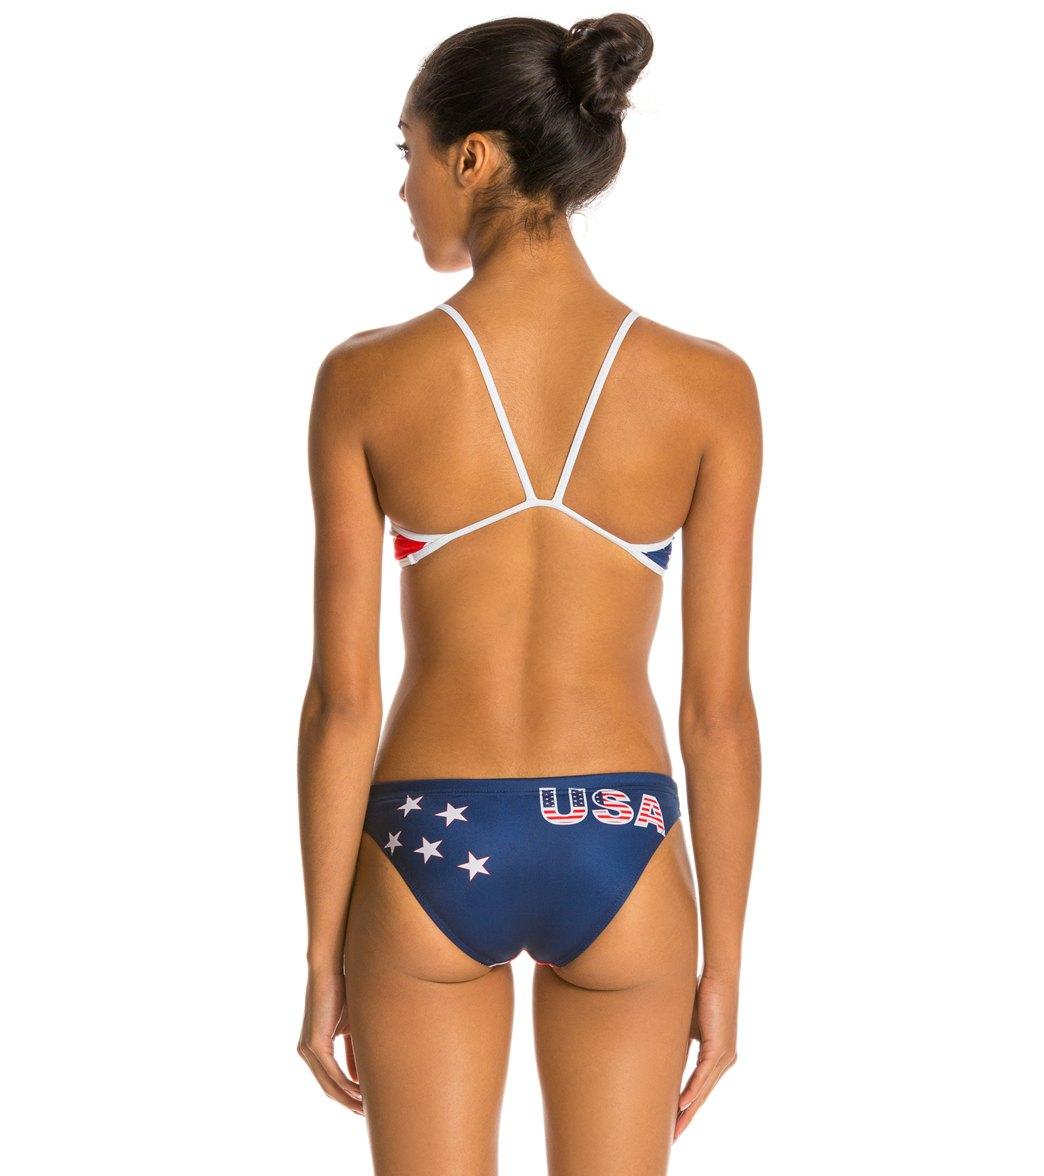 ed1926ce94 Turbo USA Flag Red White Blue Bikini Swimsuit Set at SwimOutlet.com ...